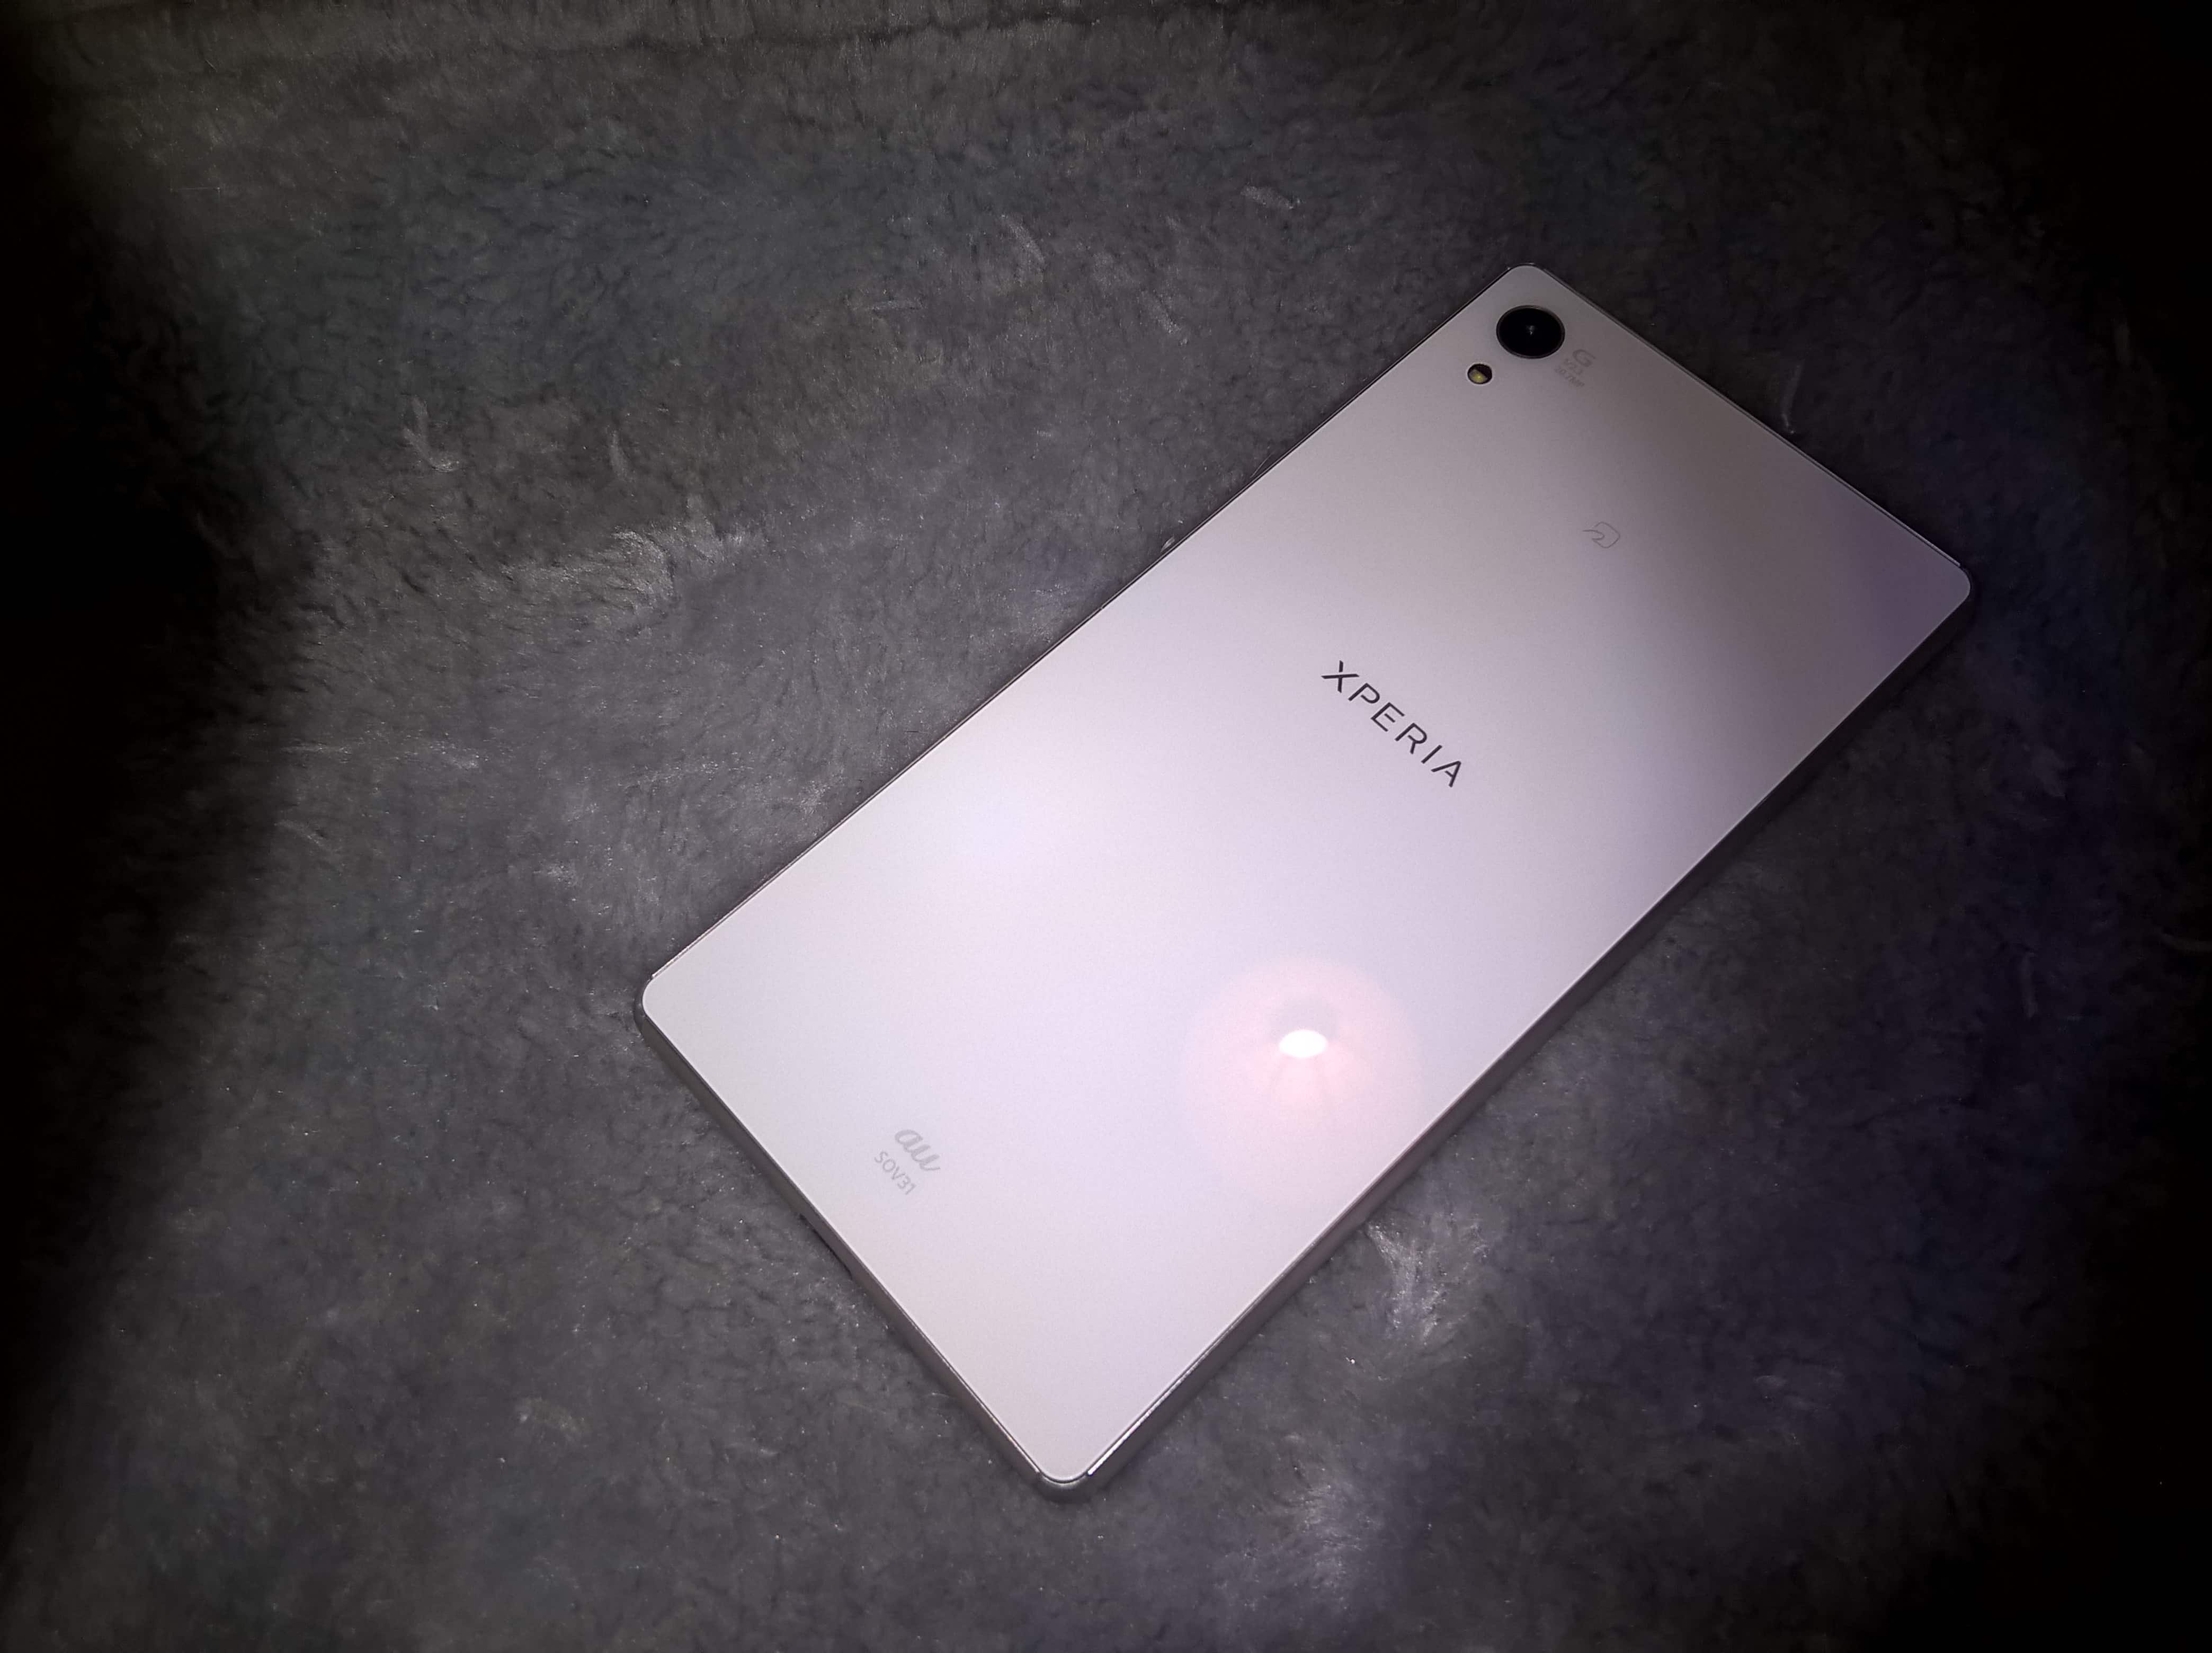 Sony Xperia Z4 σαν καινούργιο